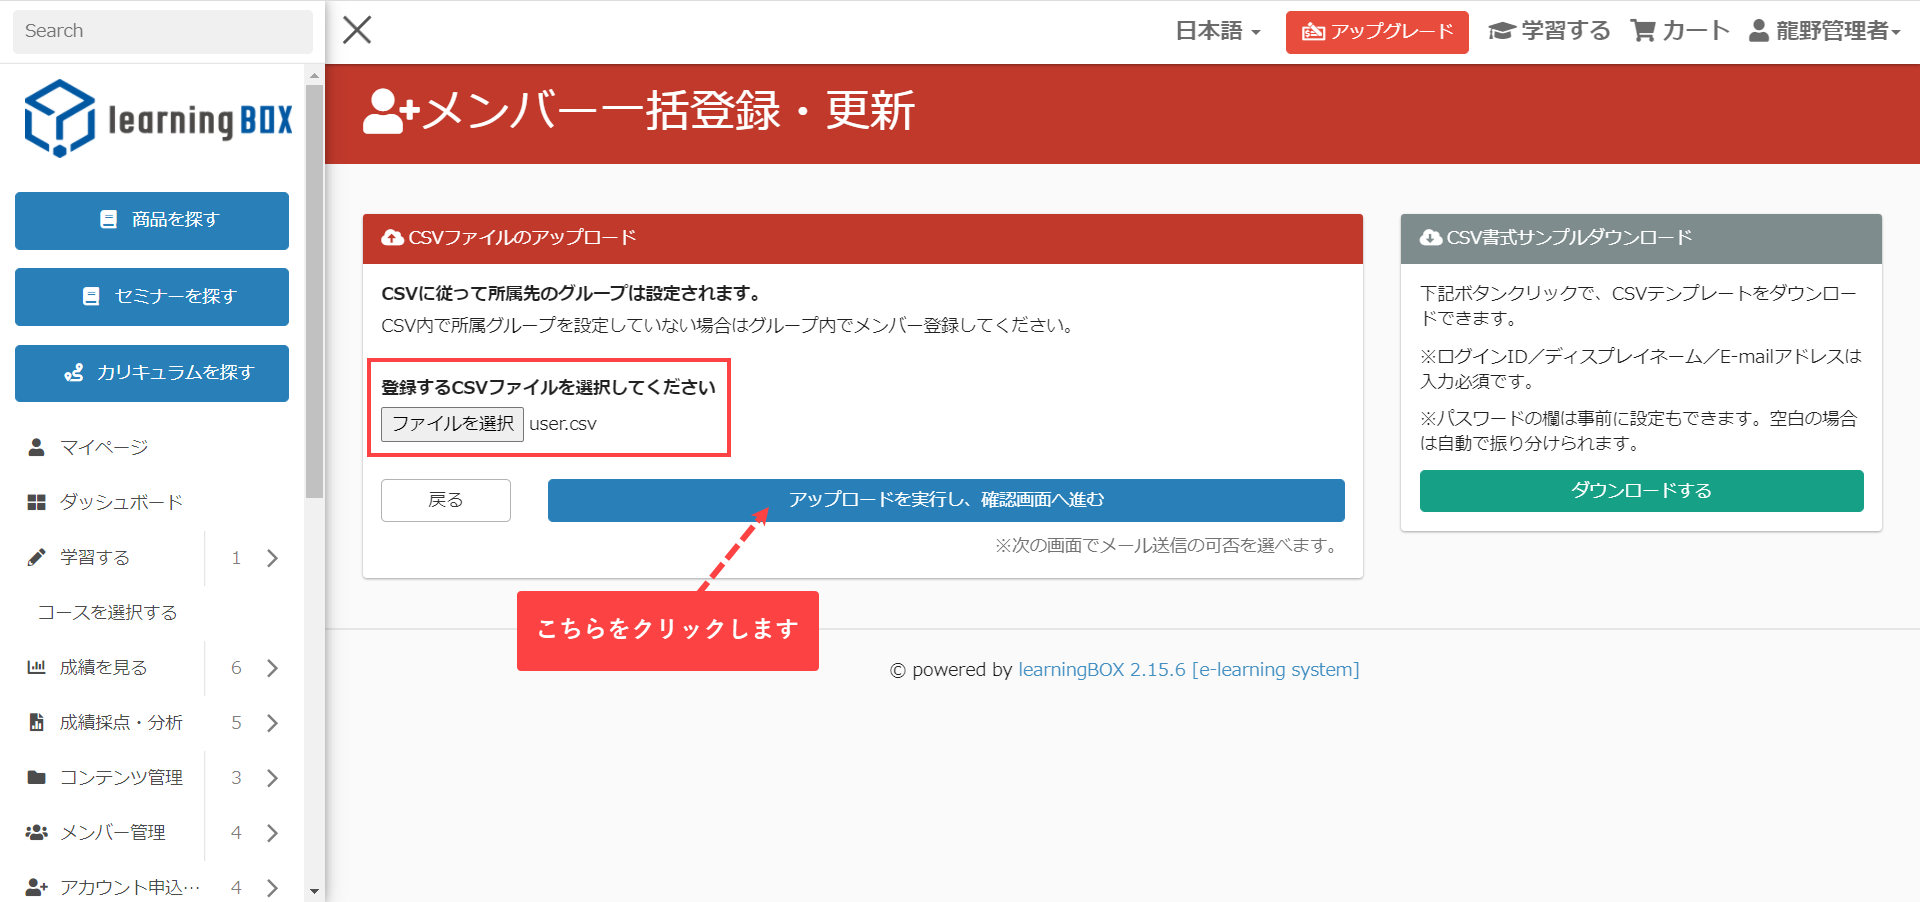 learningbox-メンバー一括登録